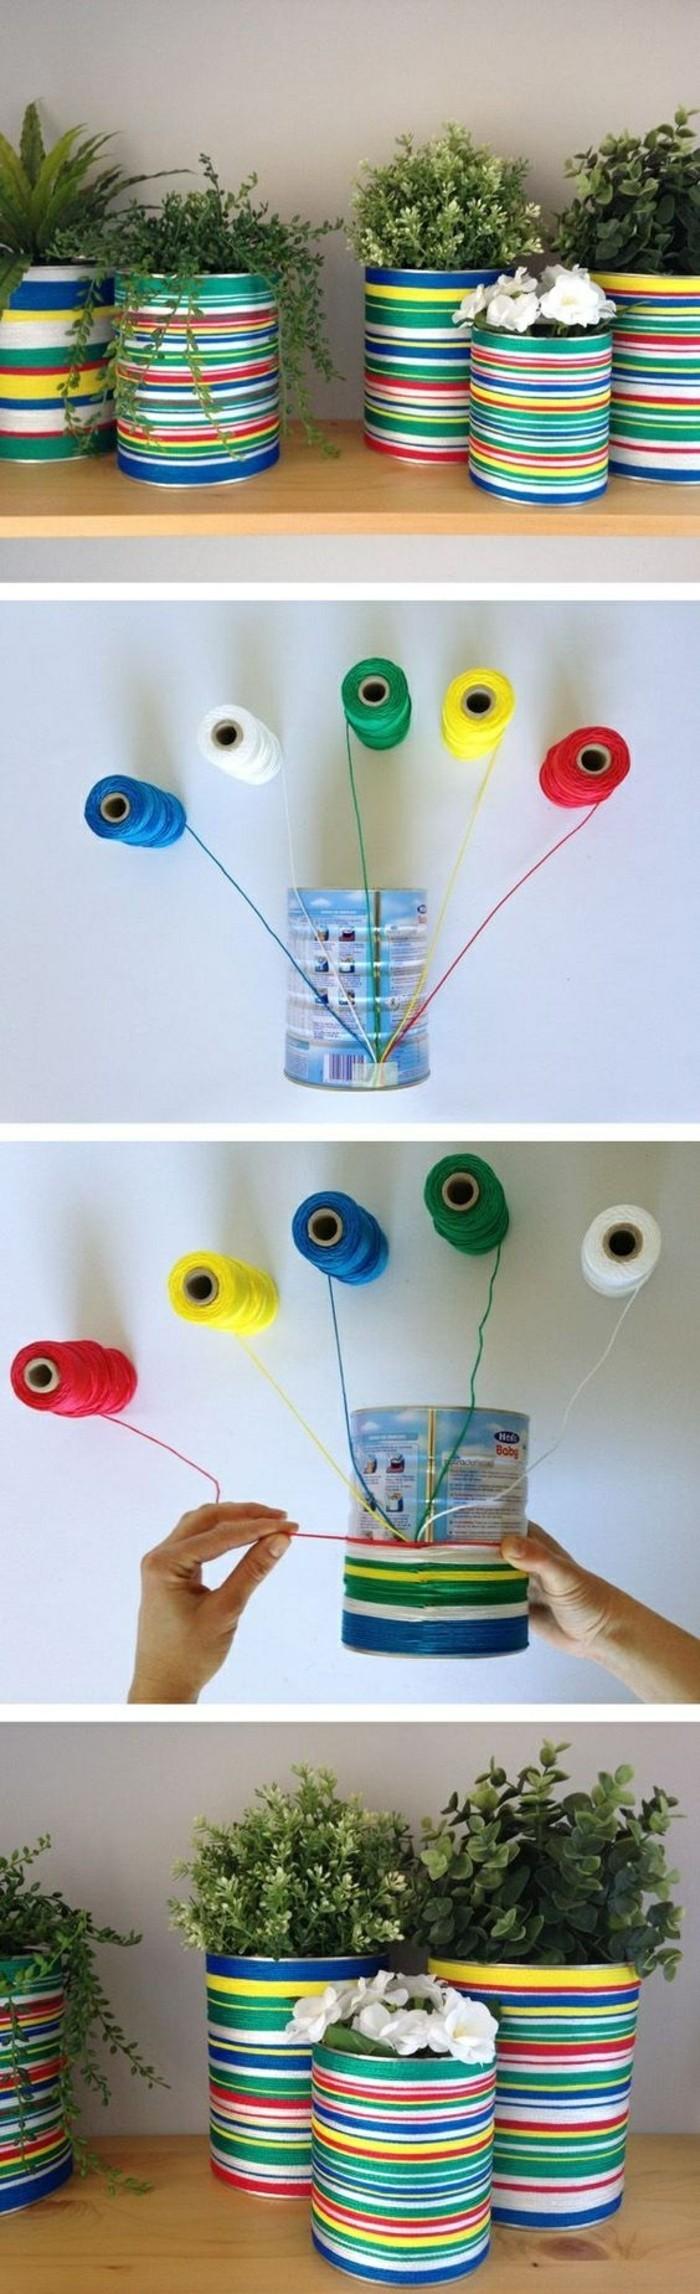 kreative-bastelideen-blumentoepfe-aus-konservendosen-faden-in-verschiedenen-farben